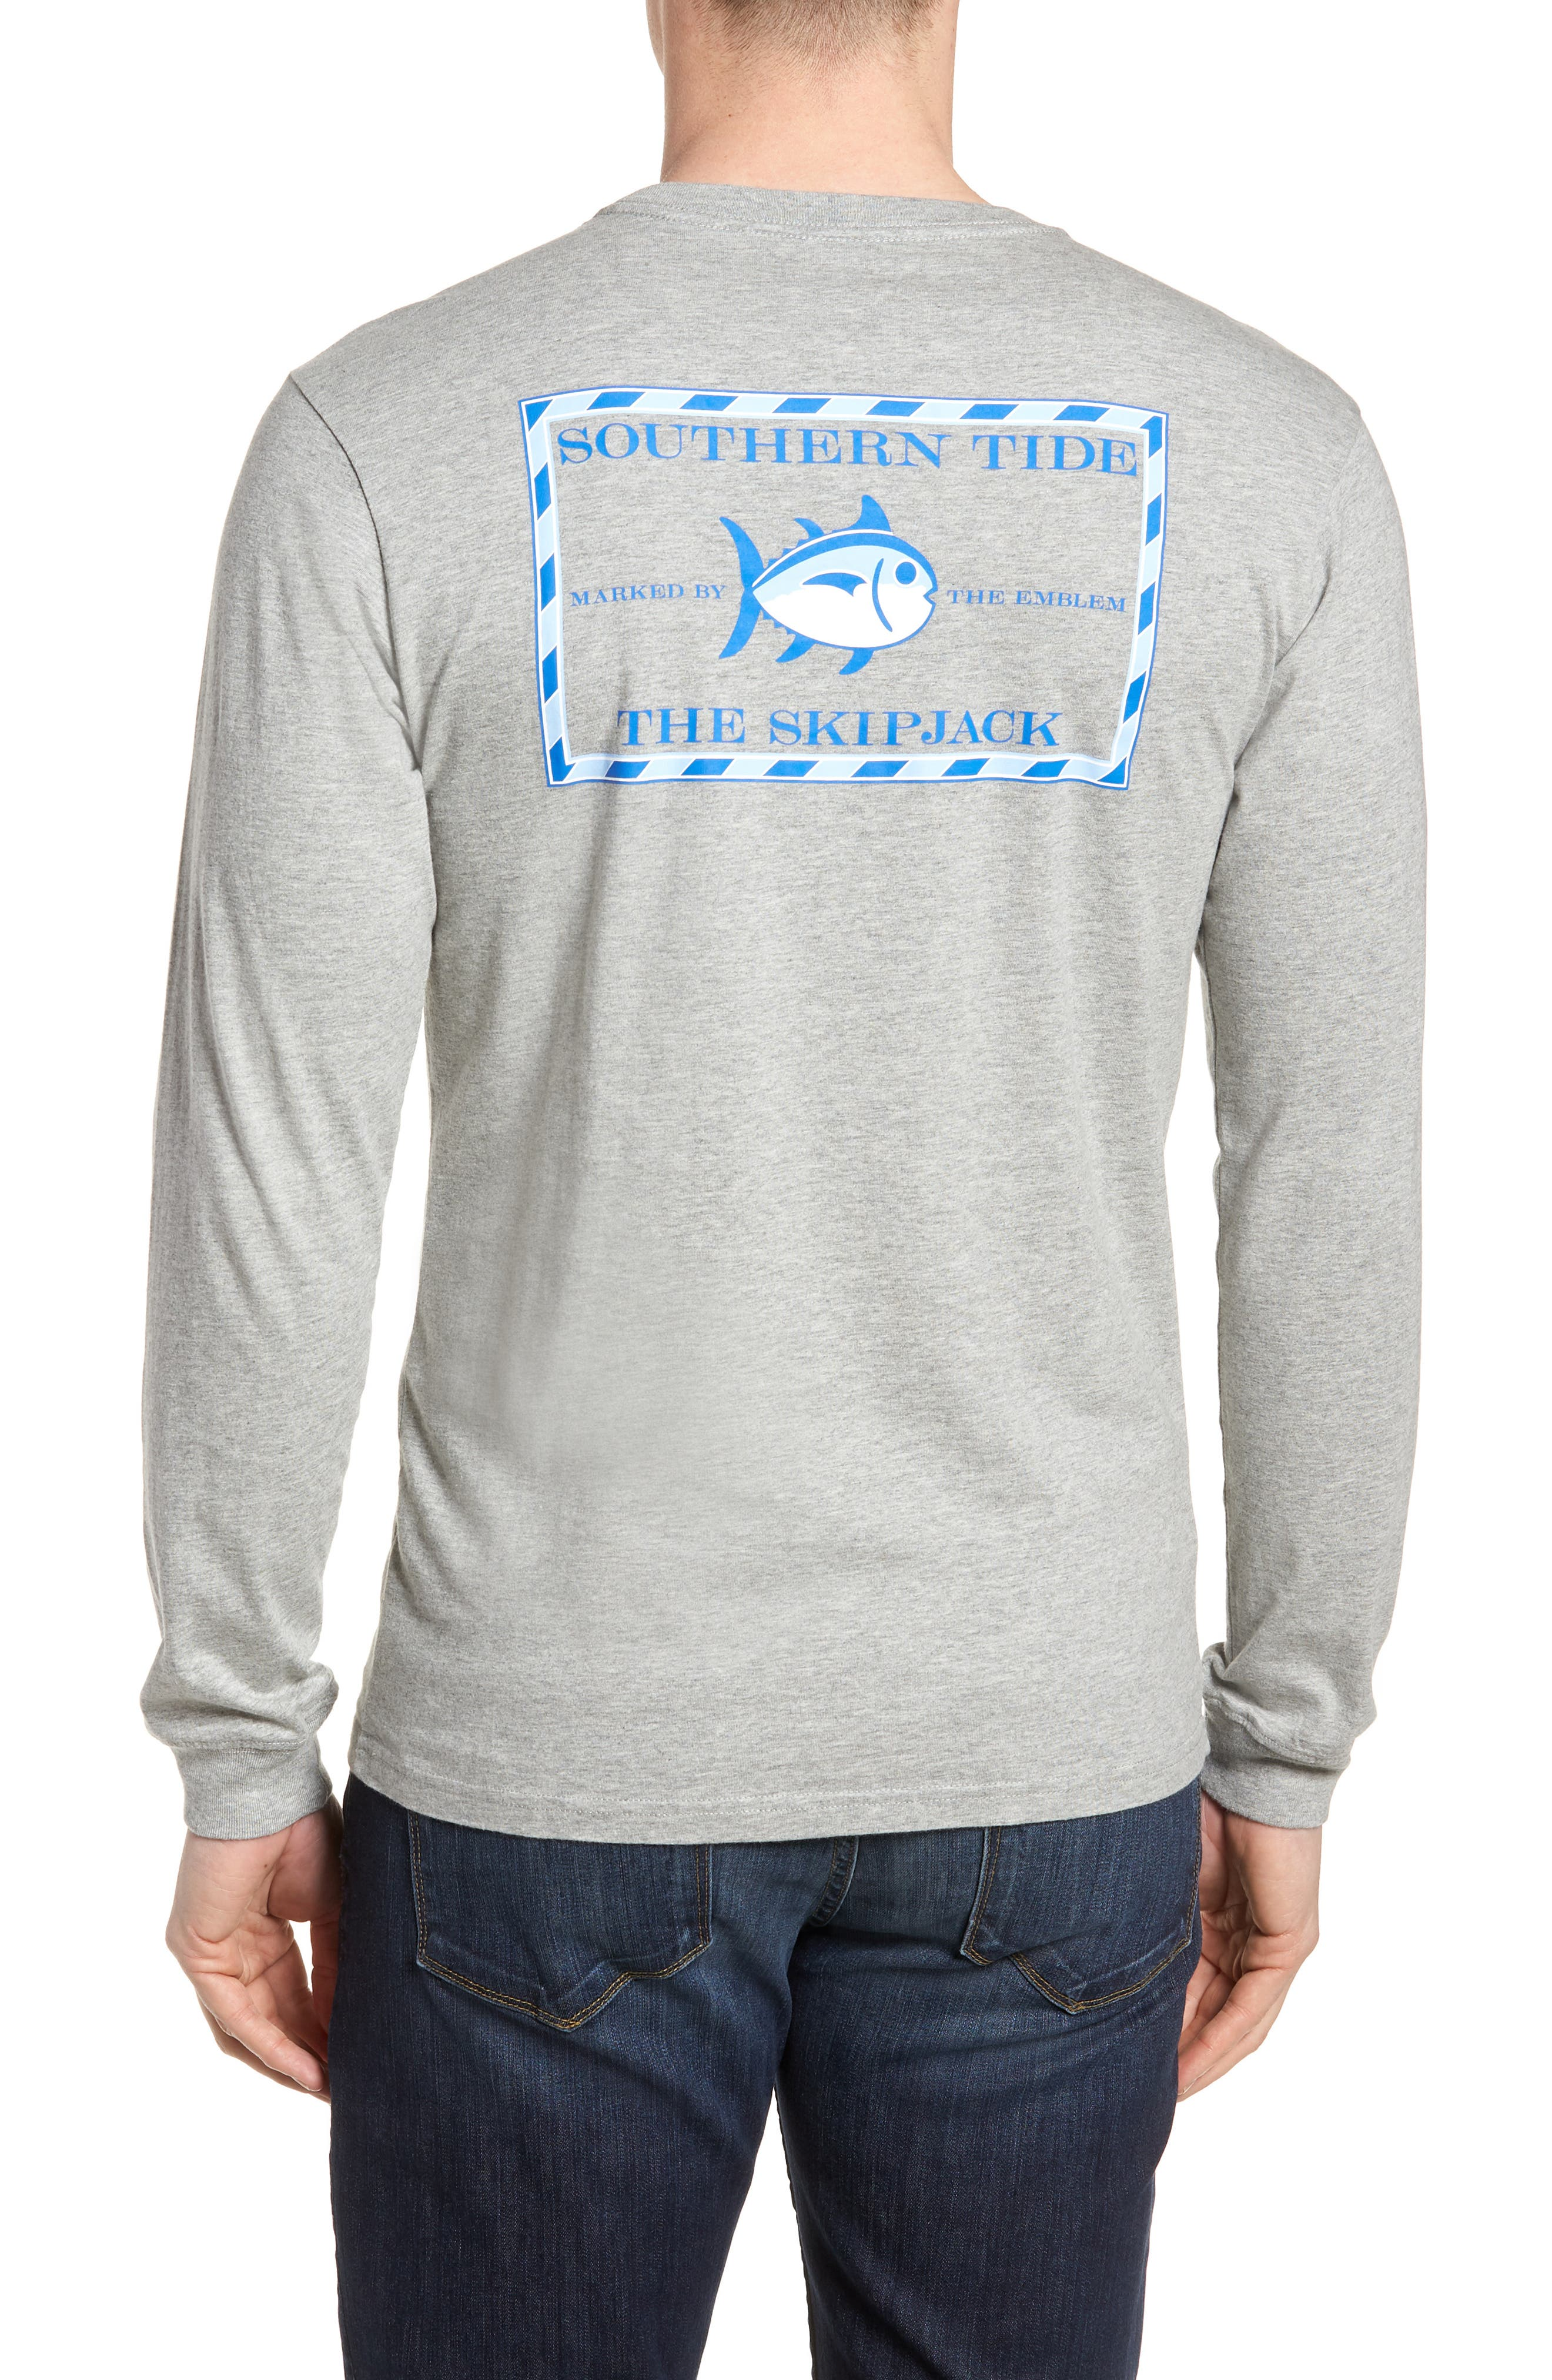 Original Skipjack T-Shirt,                             Alternate thumbnail 2, color,                             Grey